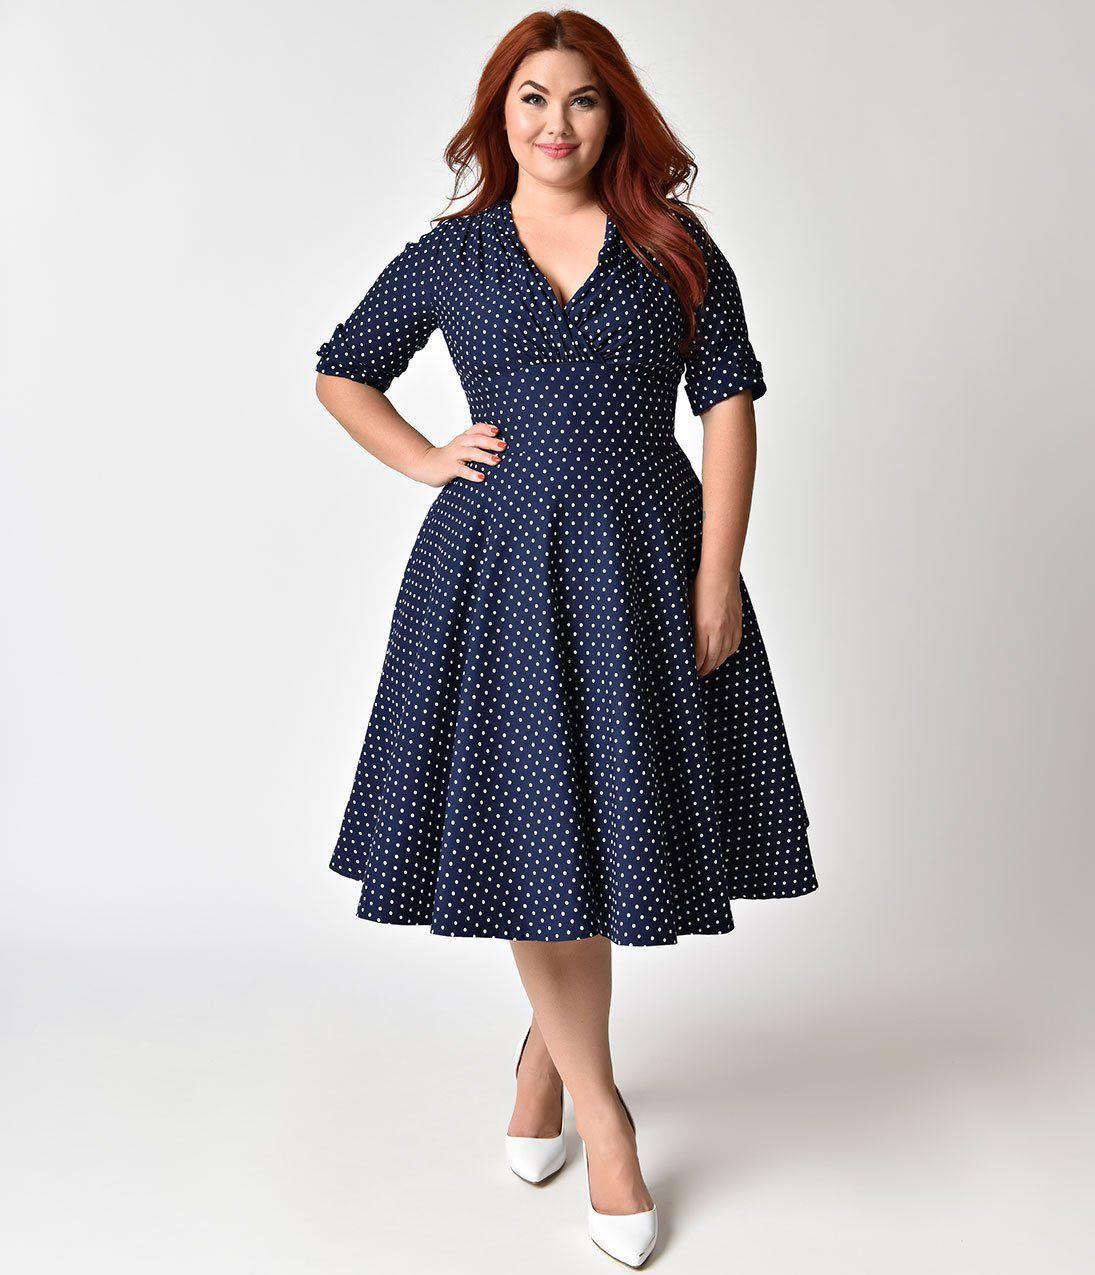 Plus Size smocked dress for women